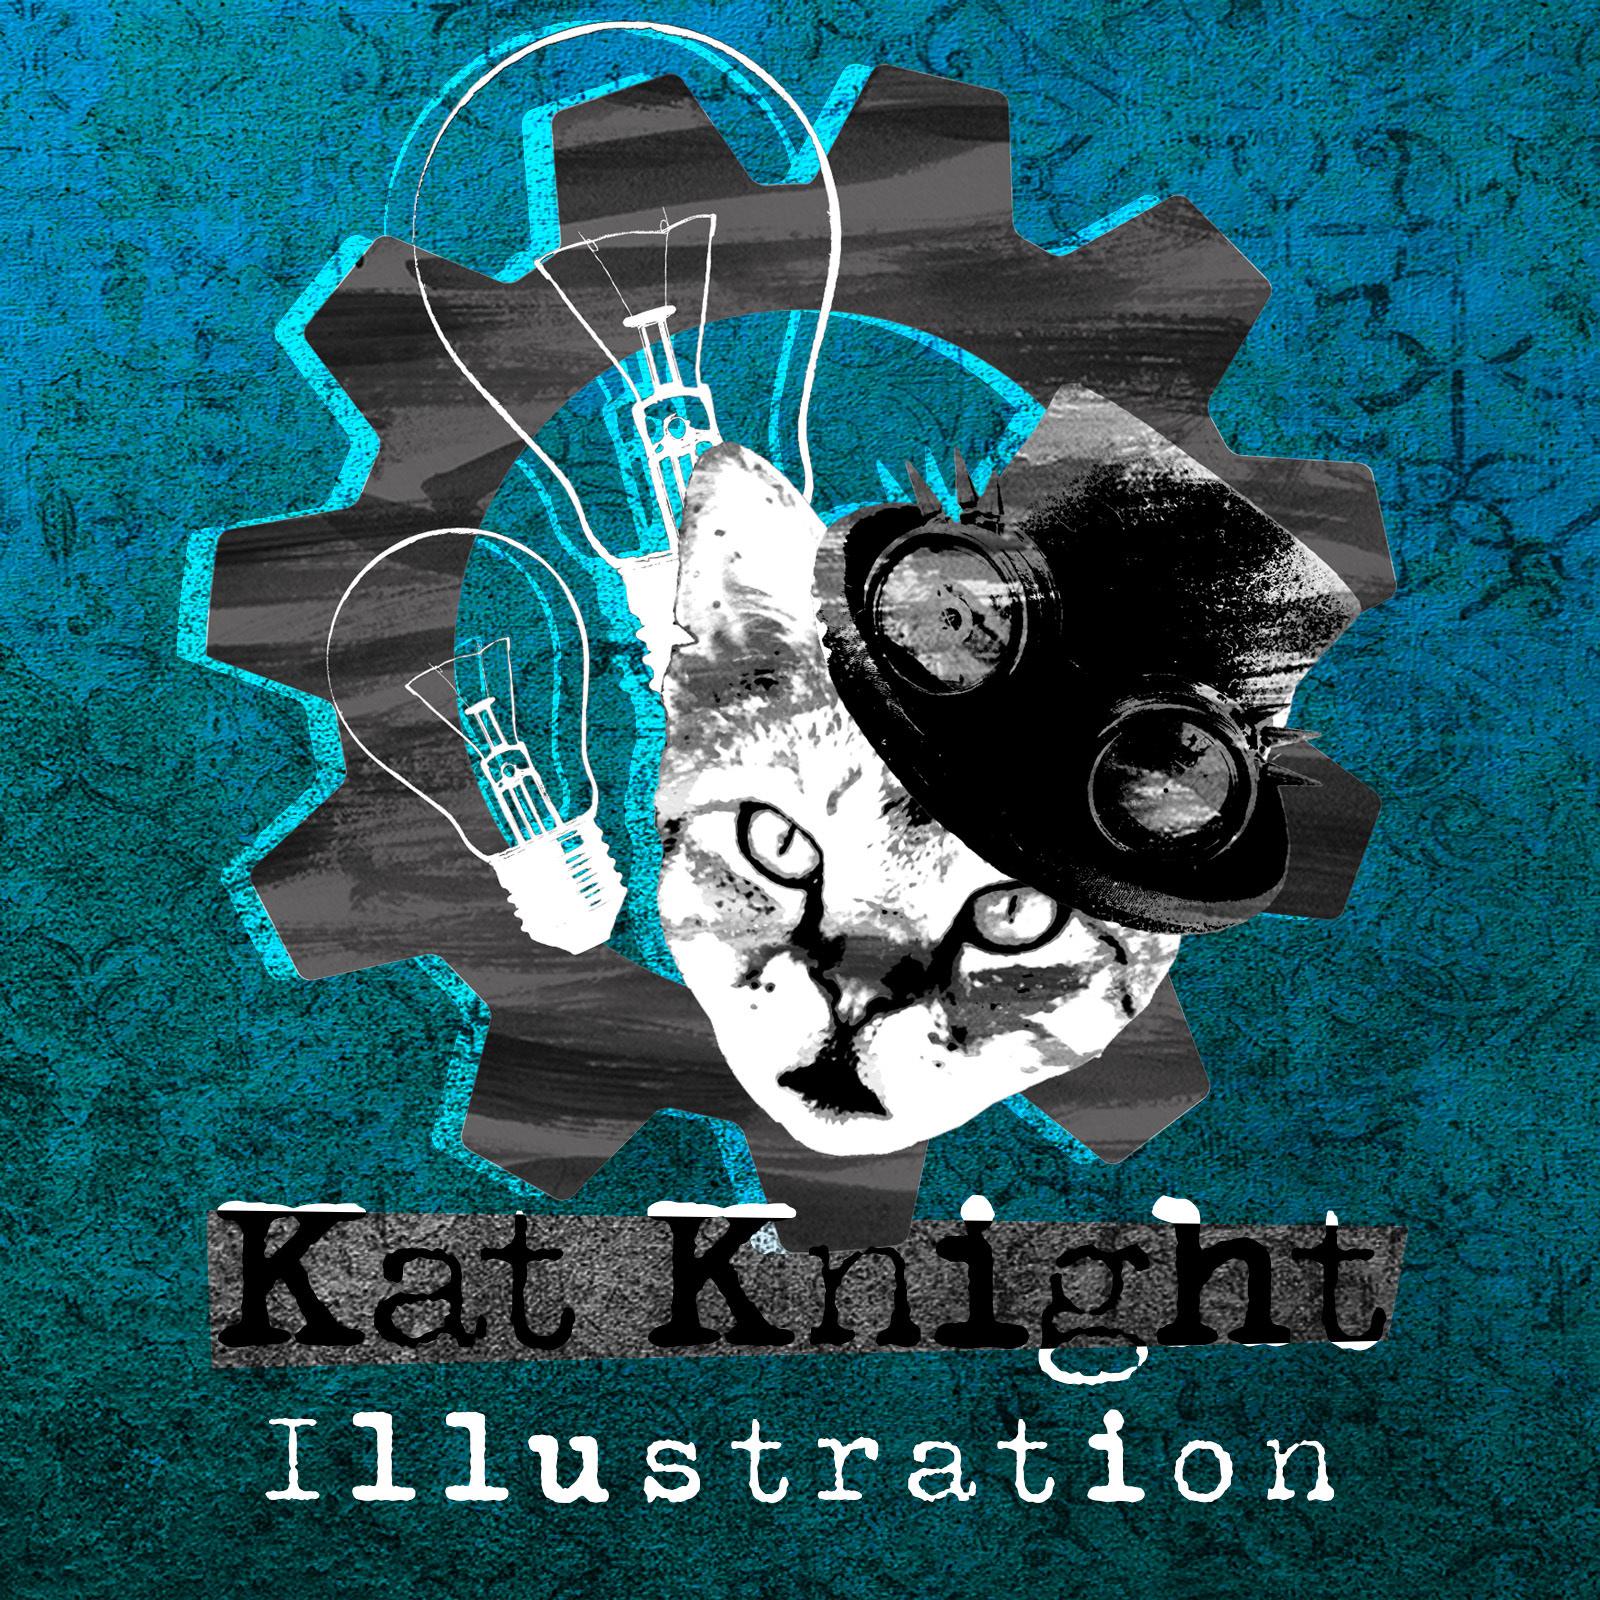 Kat Knight Illustration